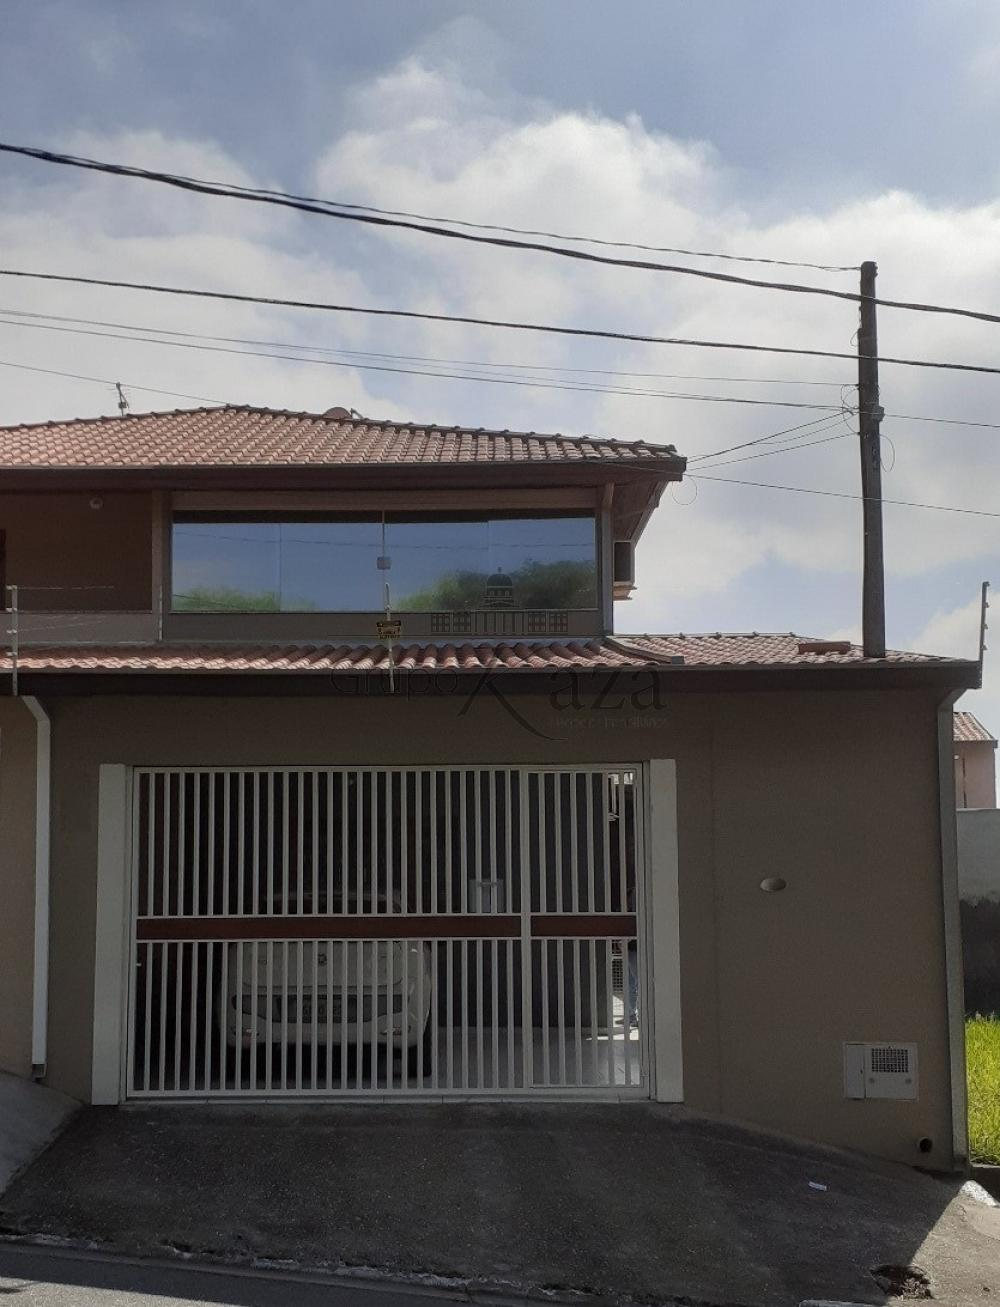 Sao Jose dos Campos Casa Venda R$500.000,00 4 Dormitorios 2 Suites Area do terreno 160.00m2 Area construida 135.00m2